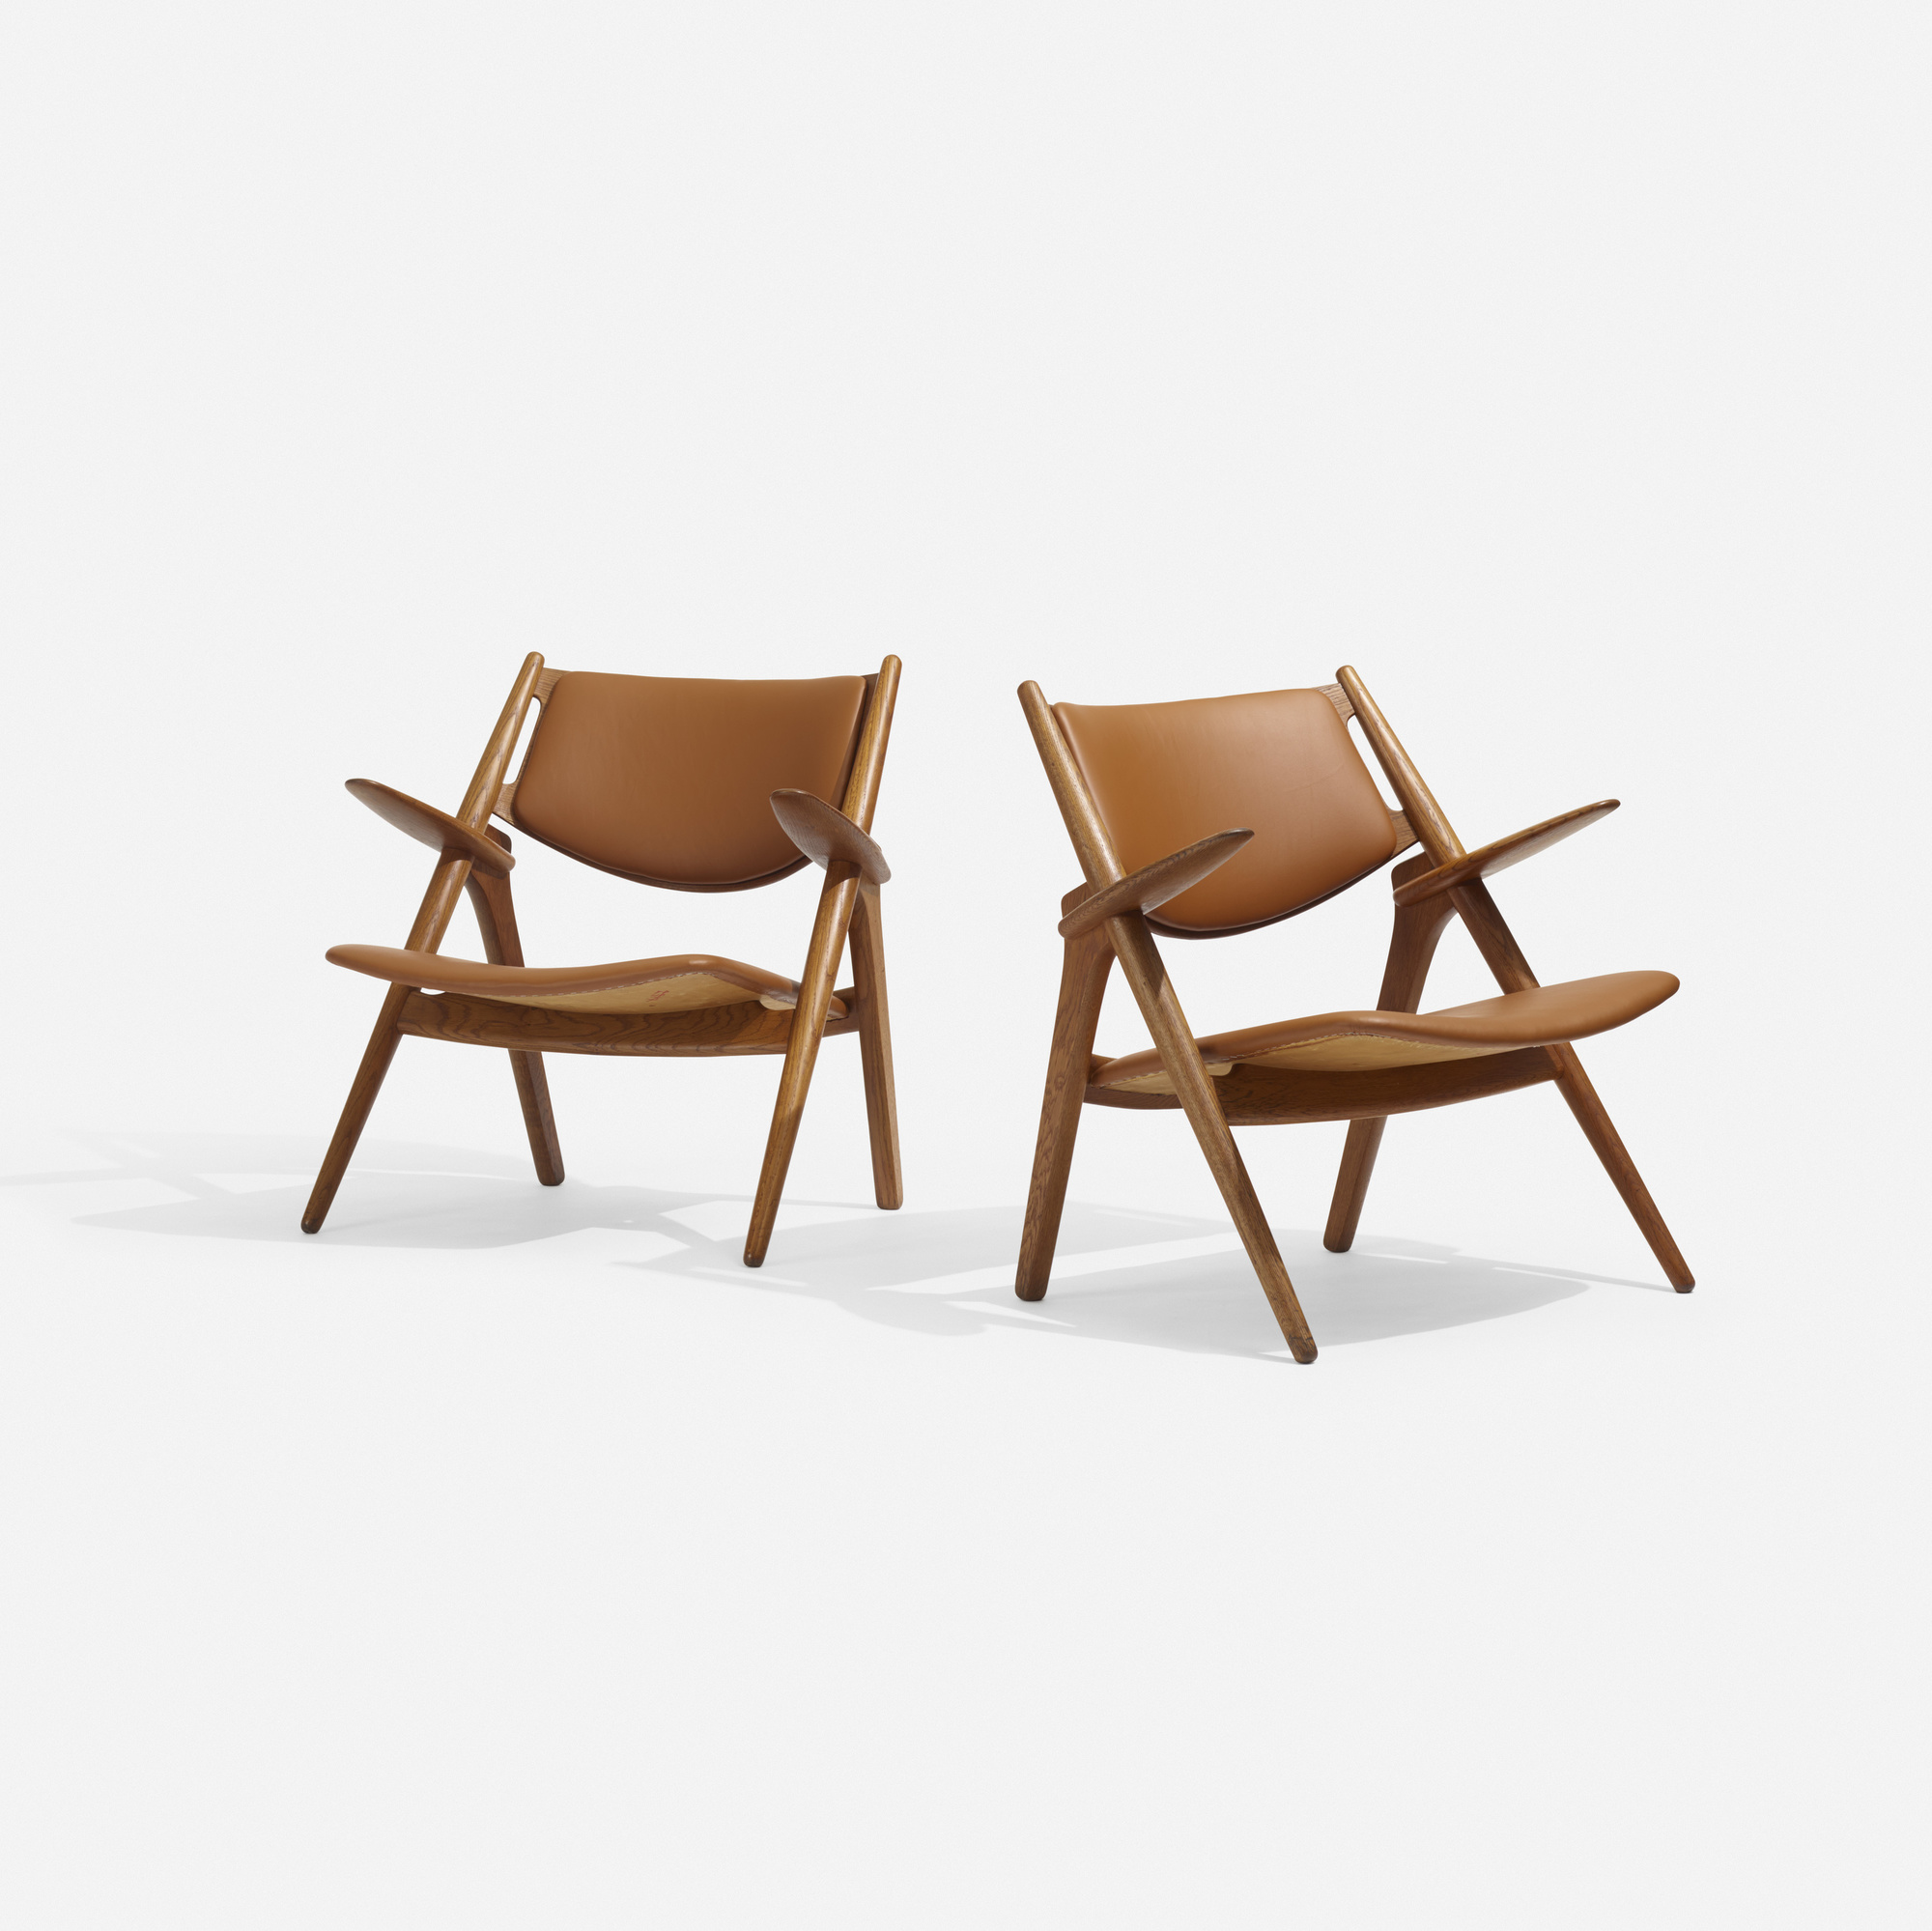 268: Hans J. Wegner / Sawbuck Lounge Chairs, Pair (1 Of 4